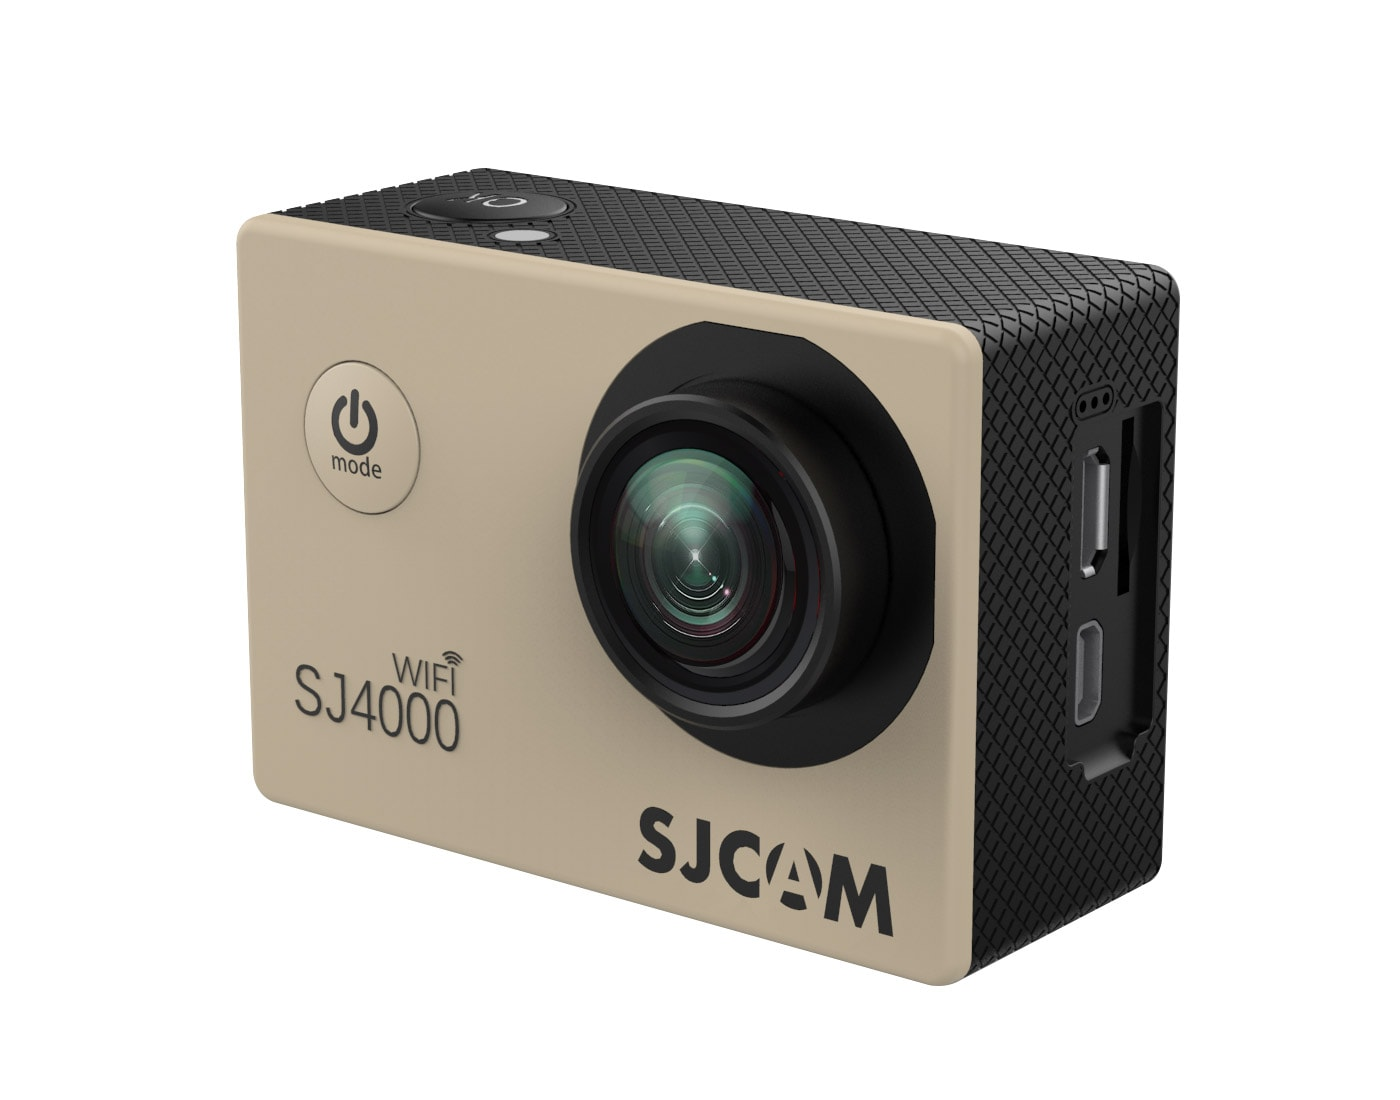 SJCAM SJ4000 WIFI Action Camera FHD1080P waterproof Underwater Camera 12MP Sports Camcorder  Red - 4